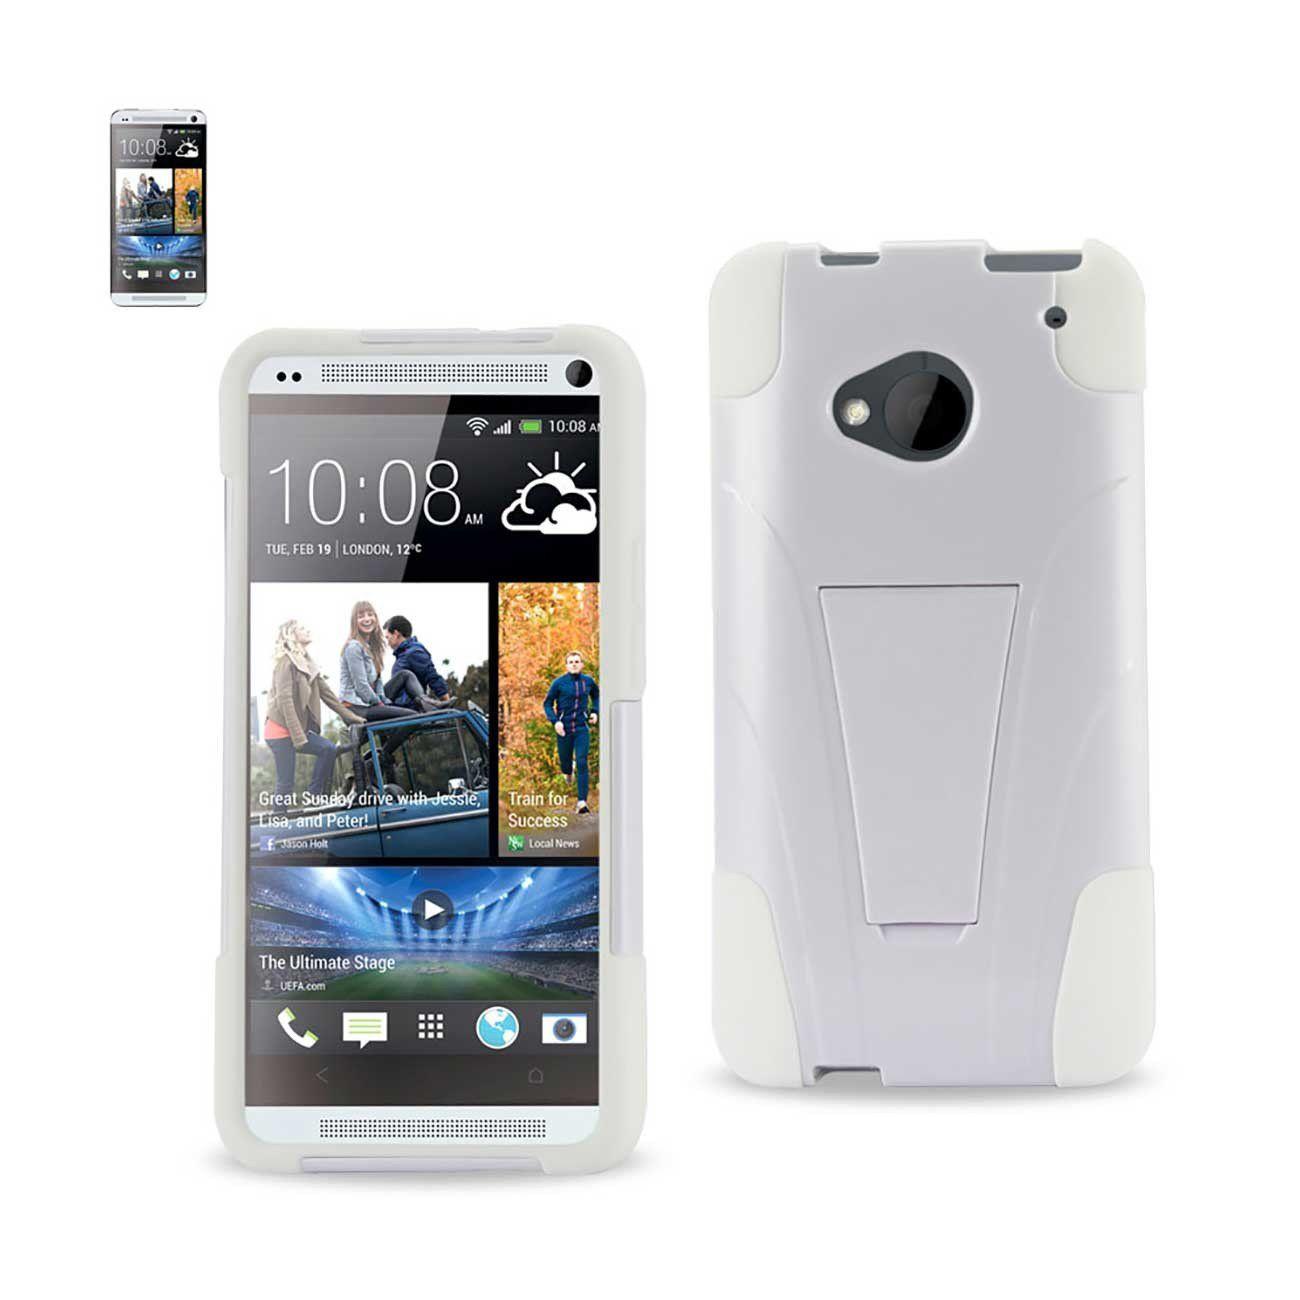 low priced 71ea1 214d5 Reiko Htc One M7 Hybrid Case With Kickstand White   MaxStrata   Shop ...